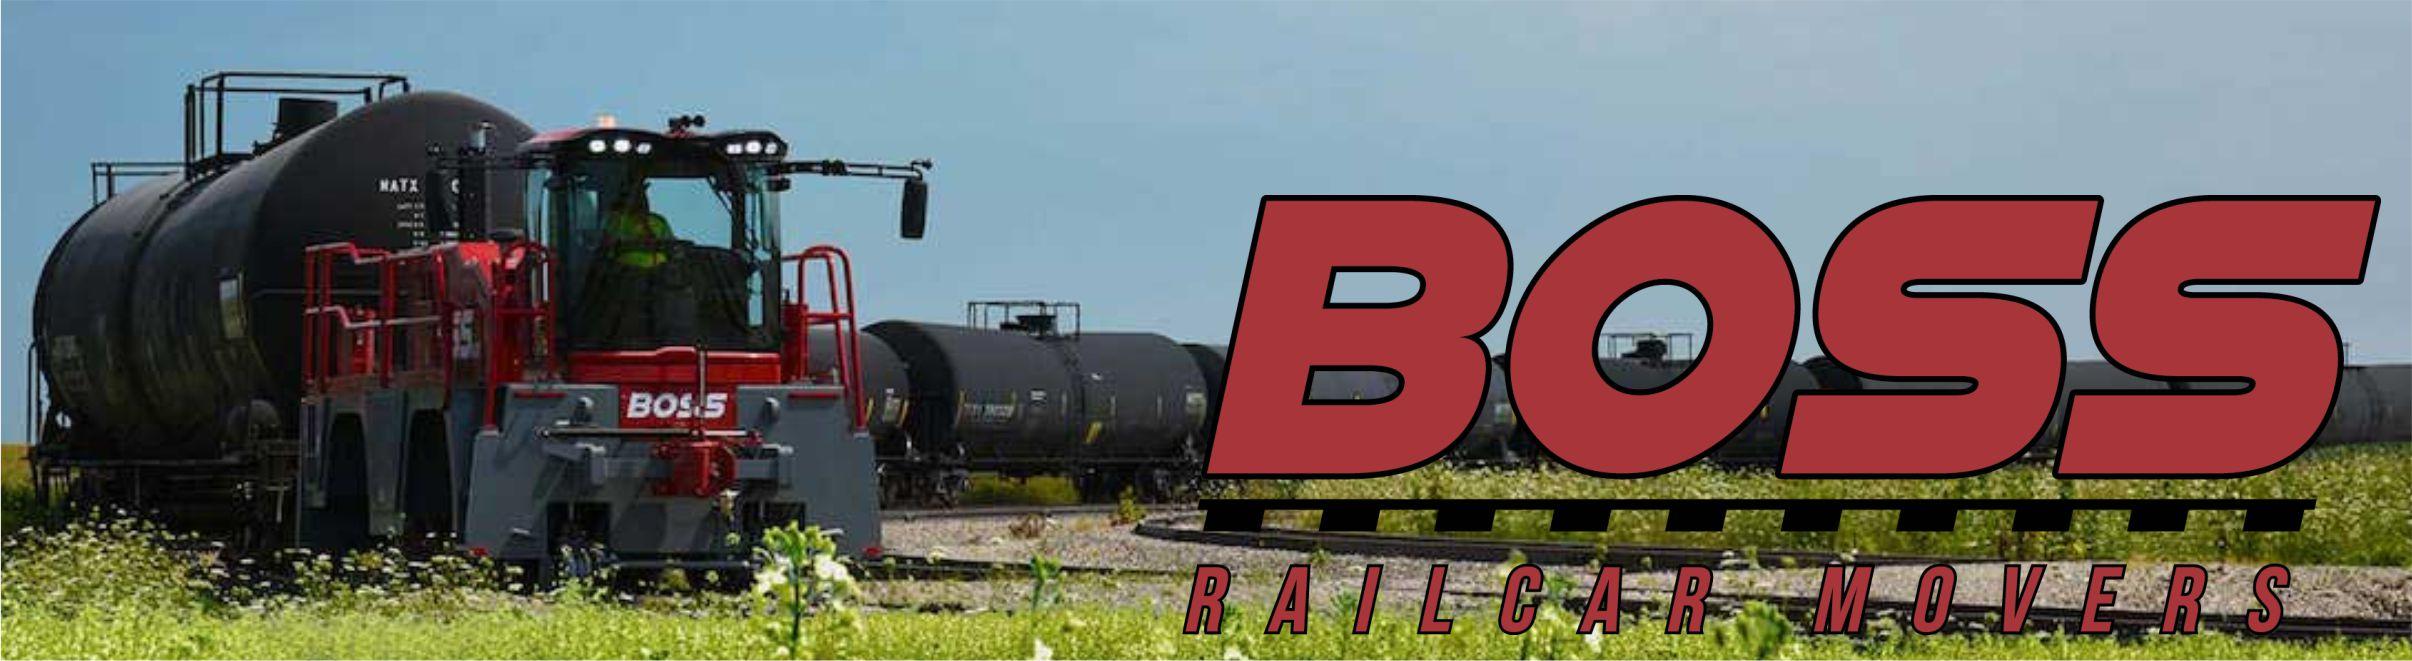 Boss Railcars